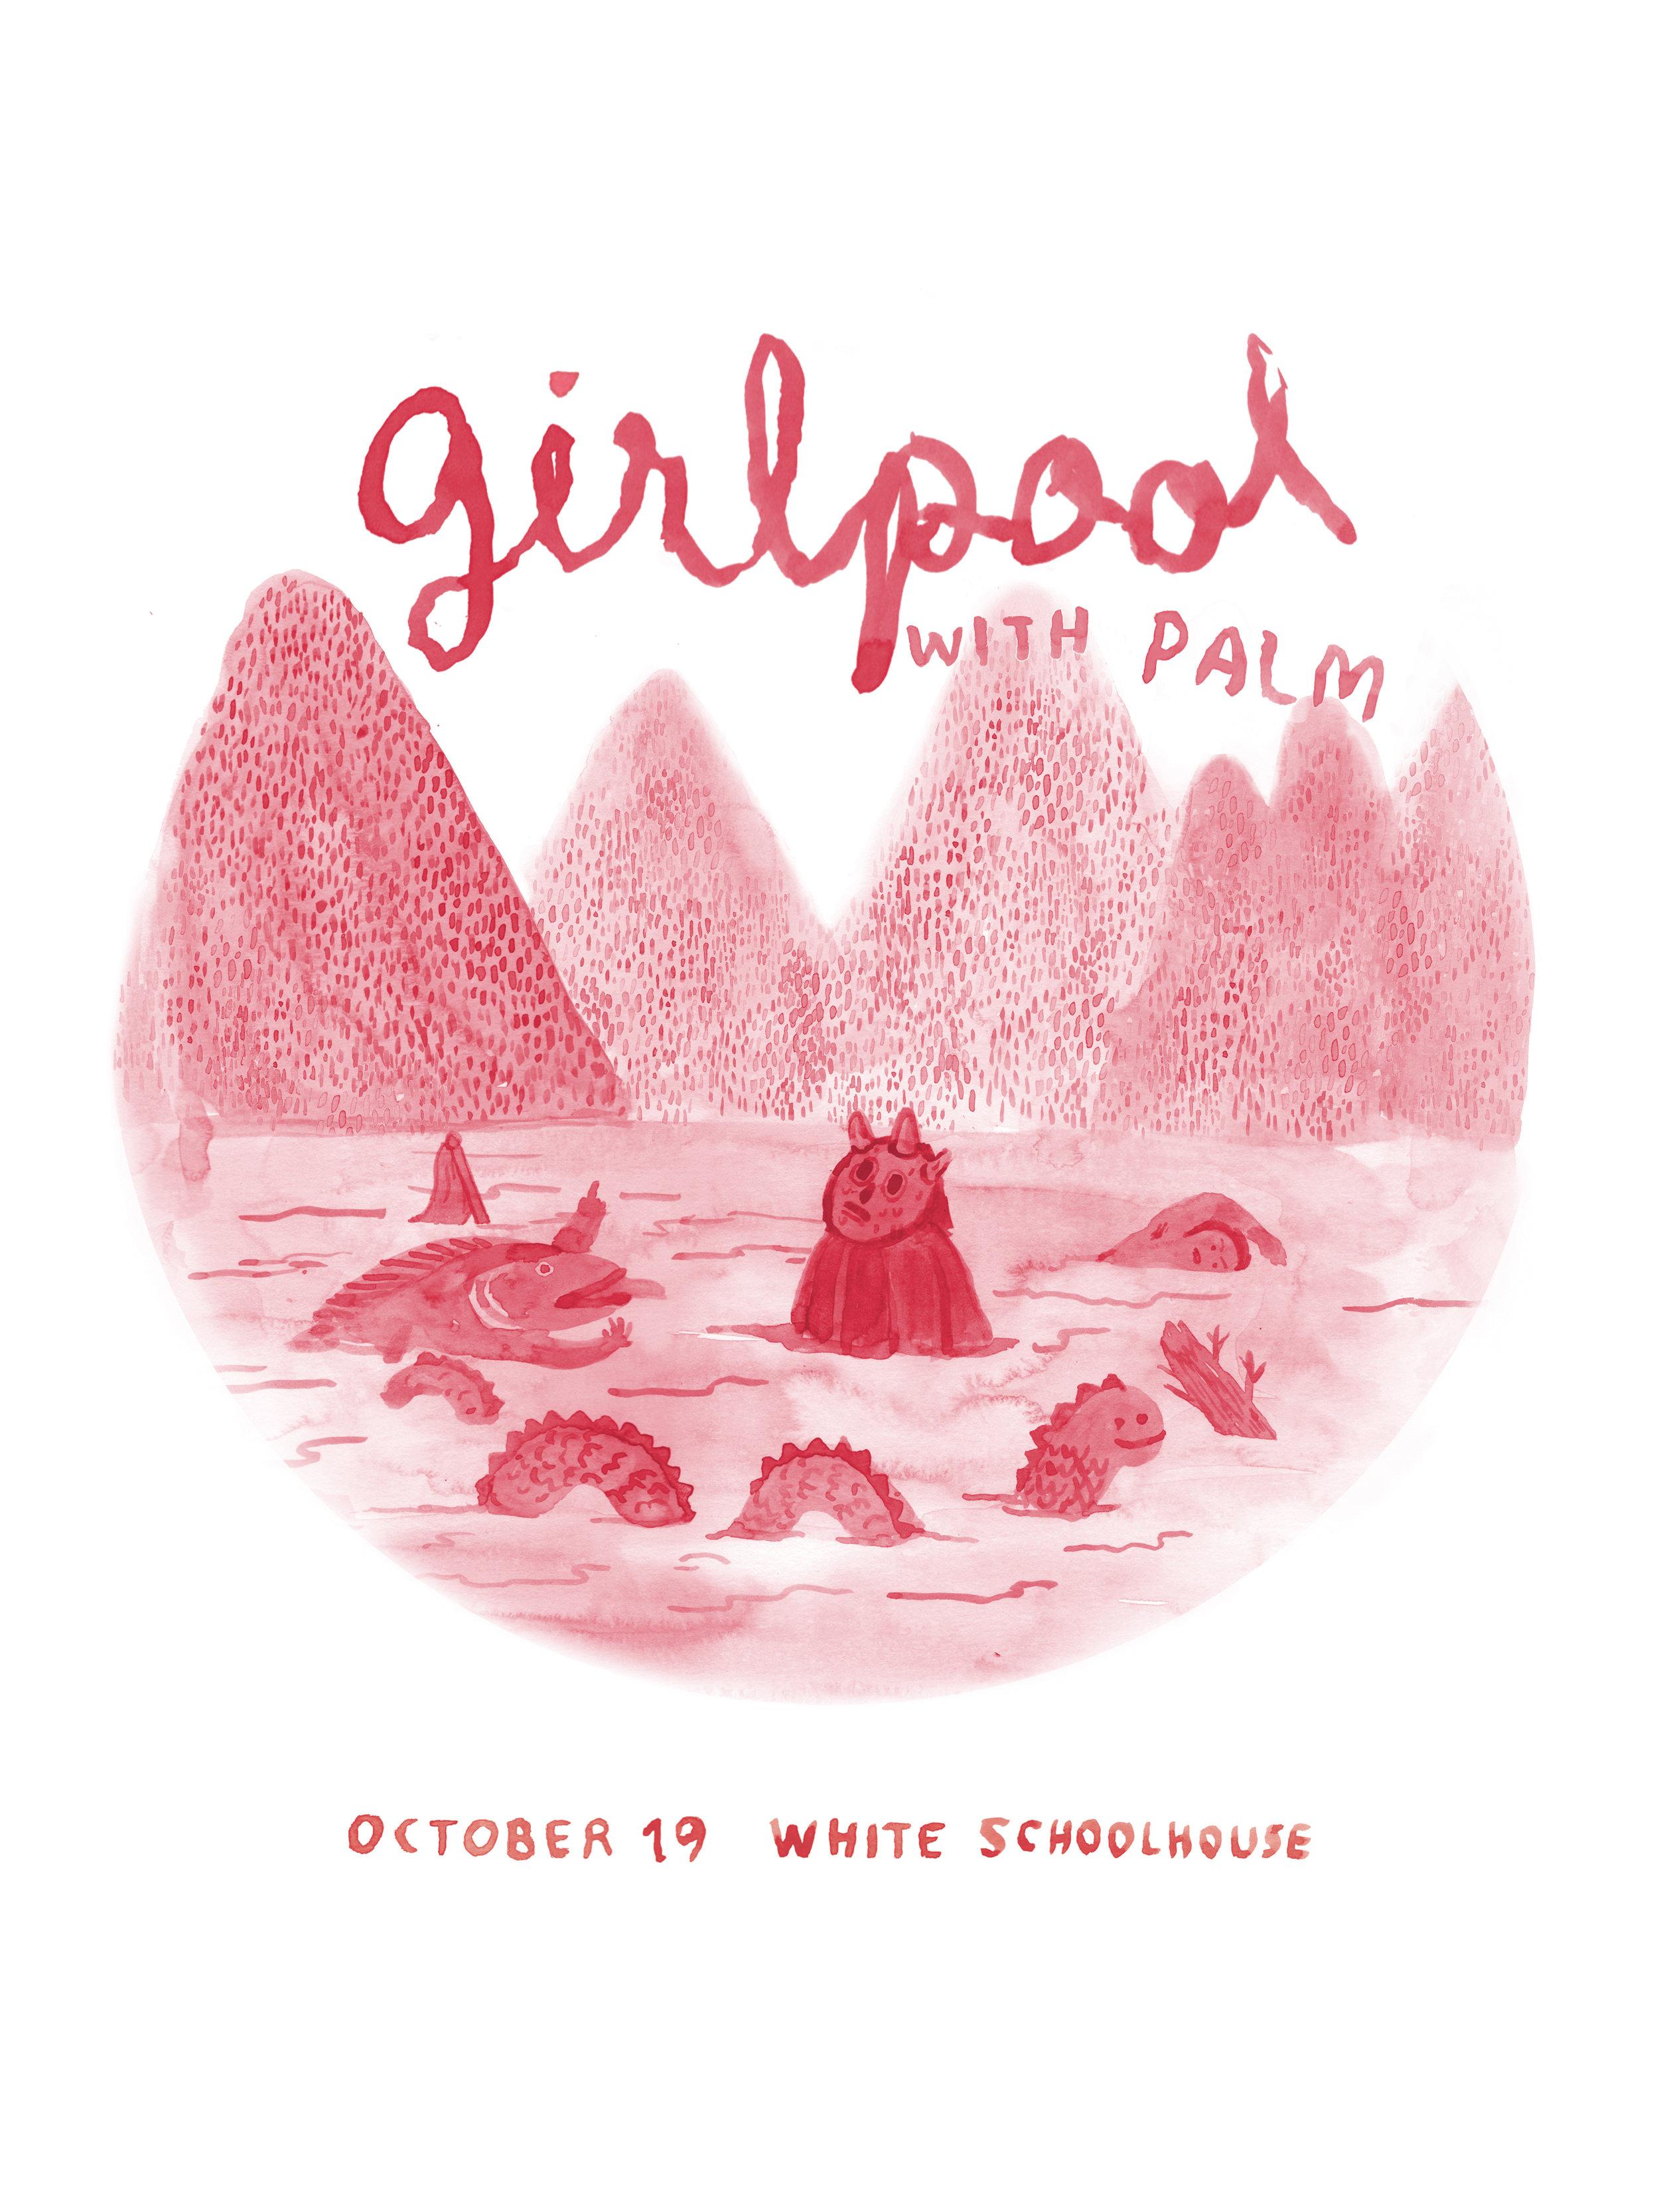 Girlpool • 10.19.17 • White Schoolhouse